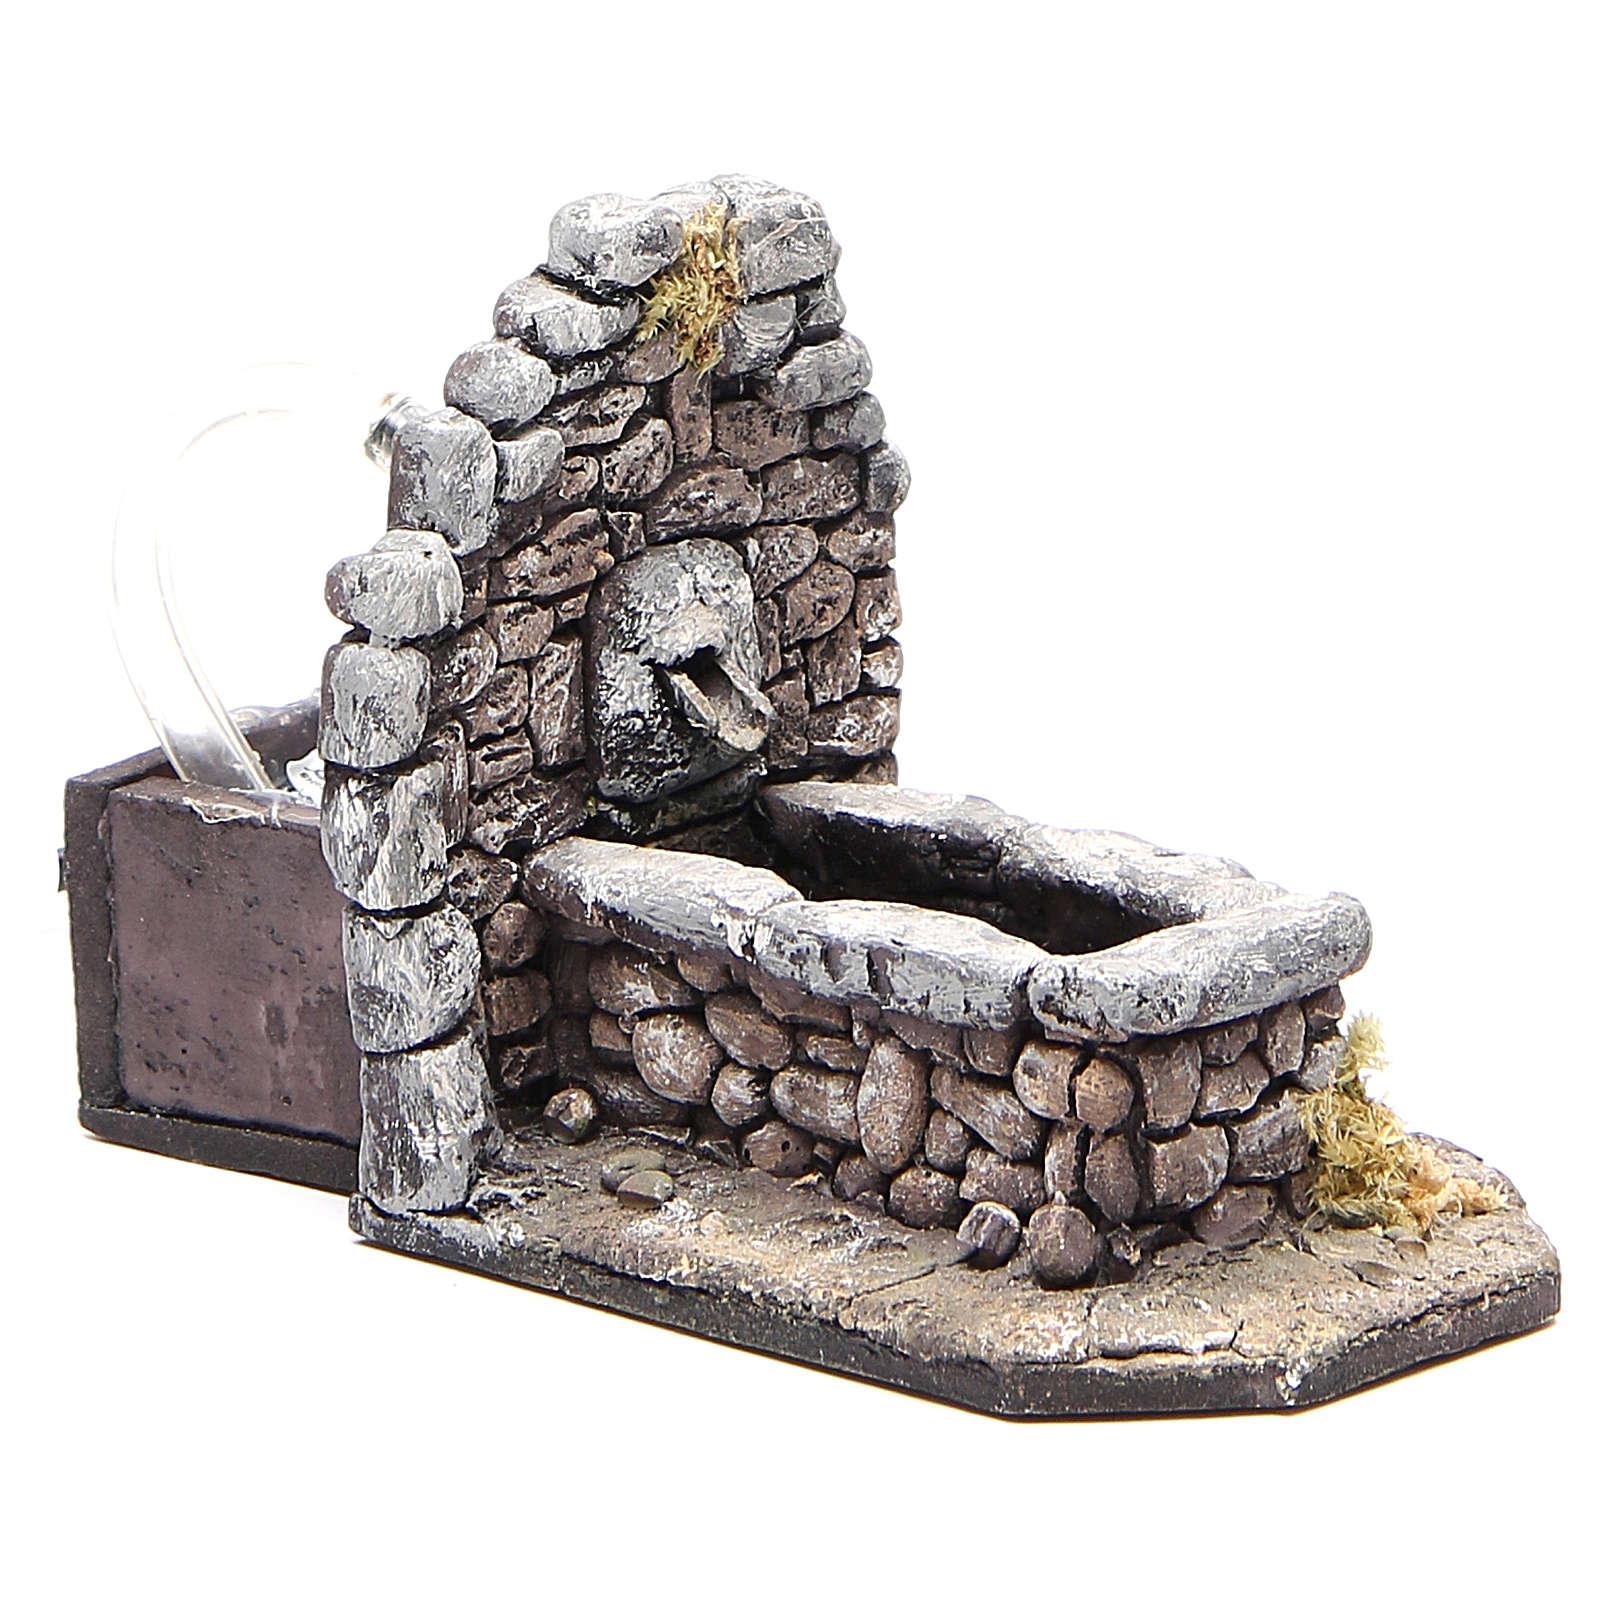 Fontana in resina tipo roccia per presepe 11x16x8 cm 4